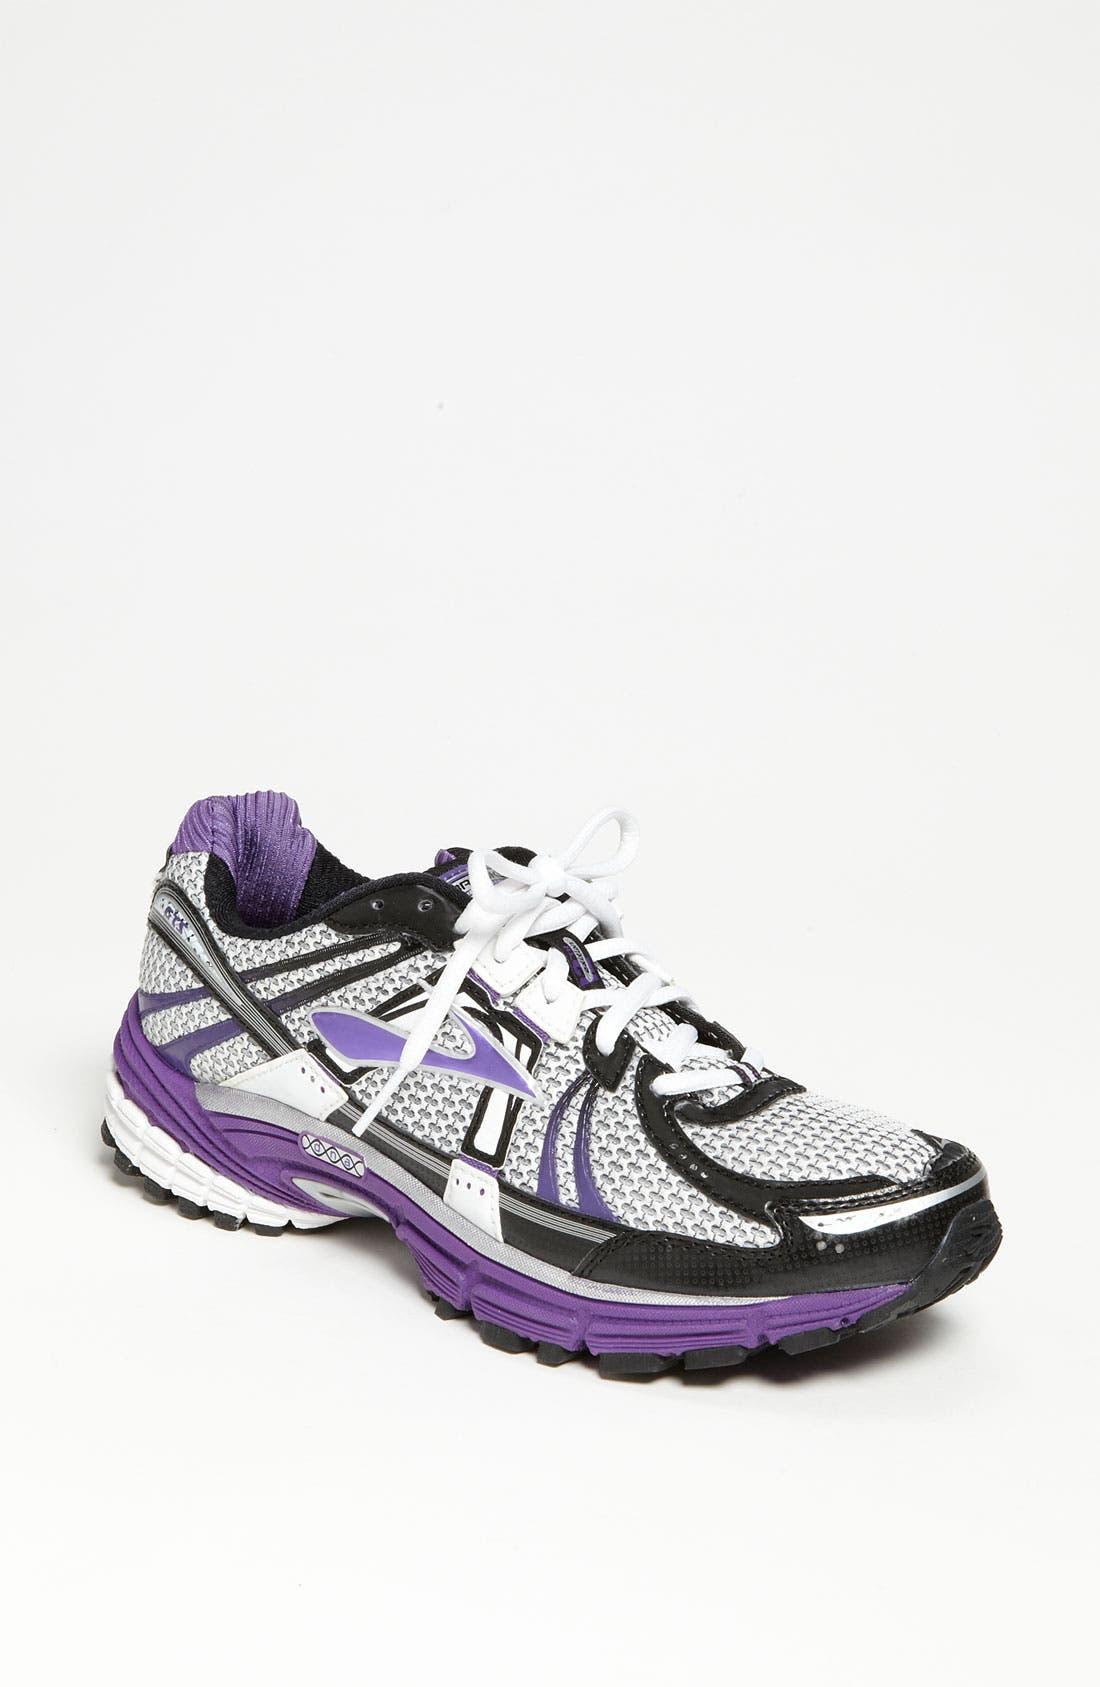 Main Image - Brooks 'Adrenaline GTS 12' Running Shoe (Women) (Regular Retail Price: $109.95)